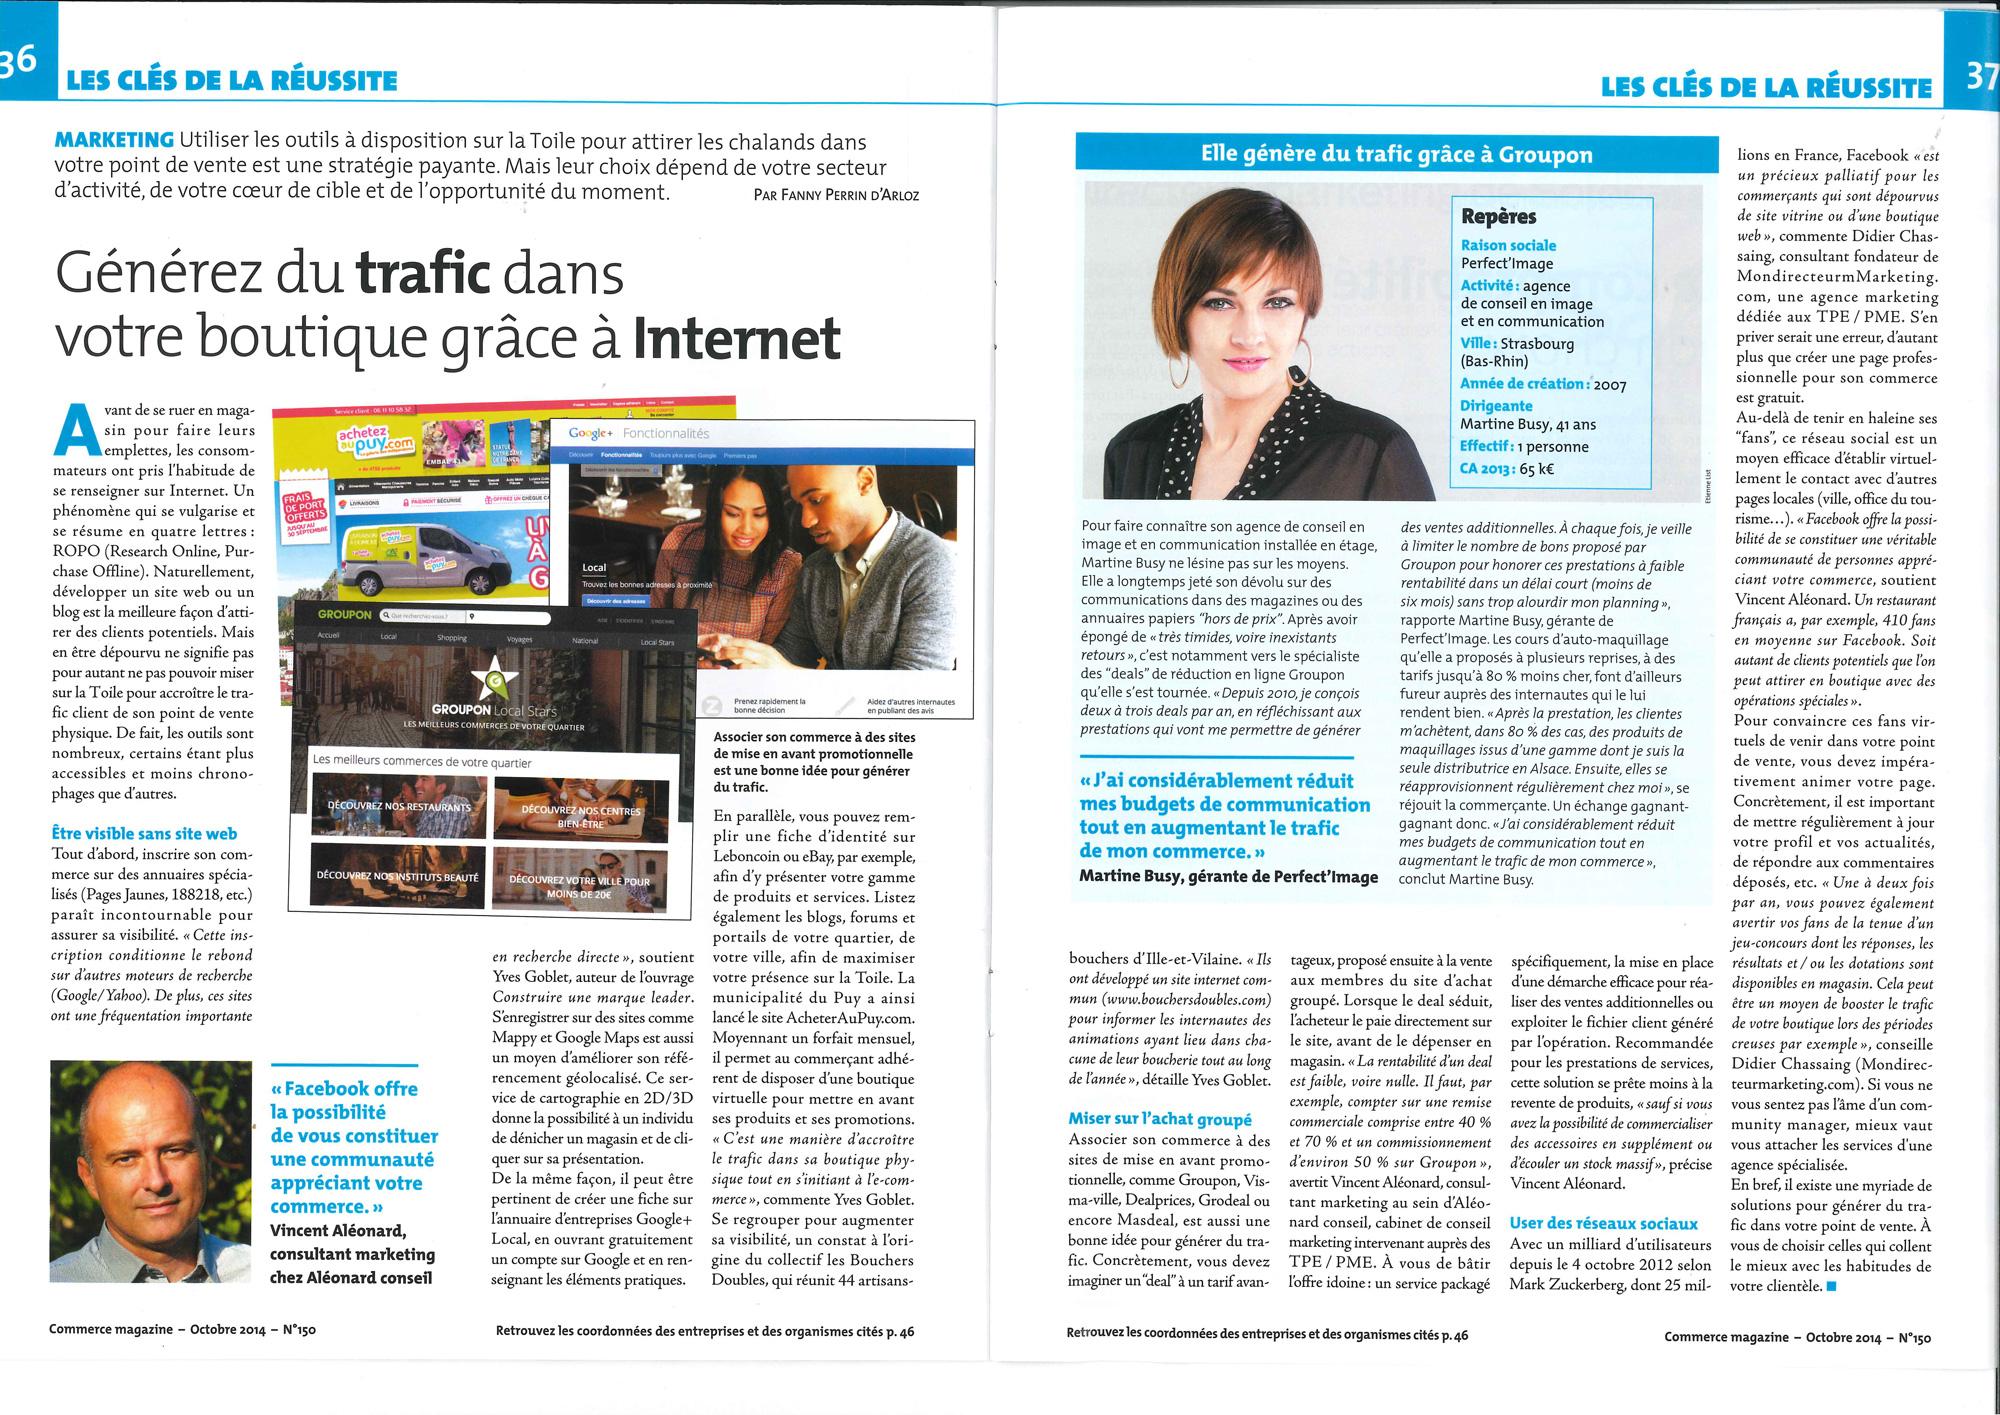 CommerceMagazine